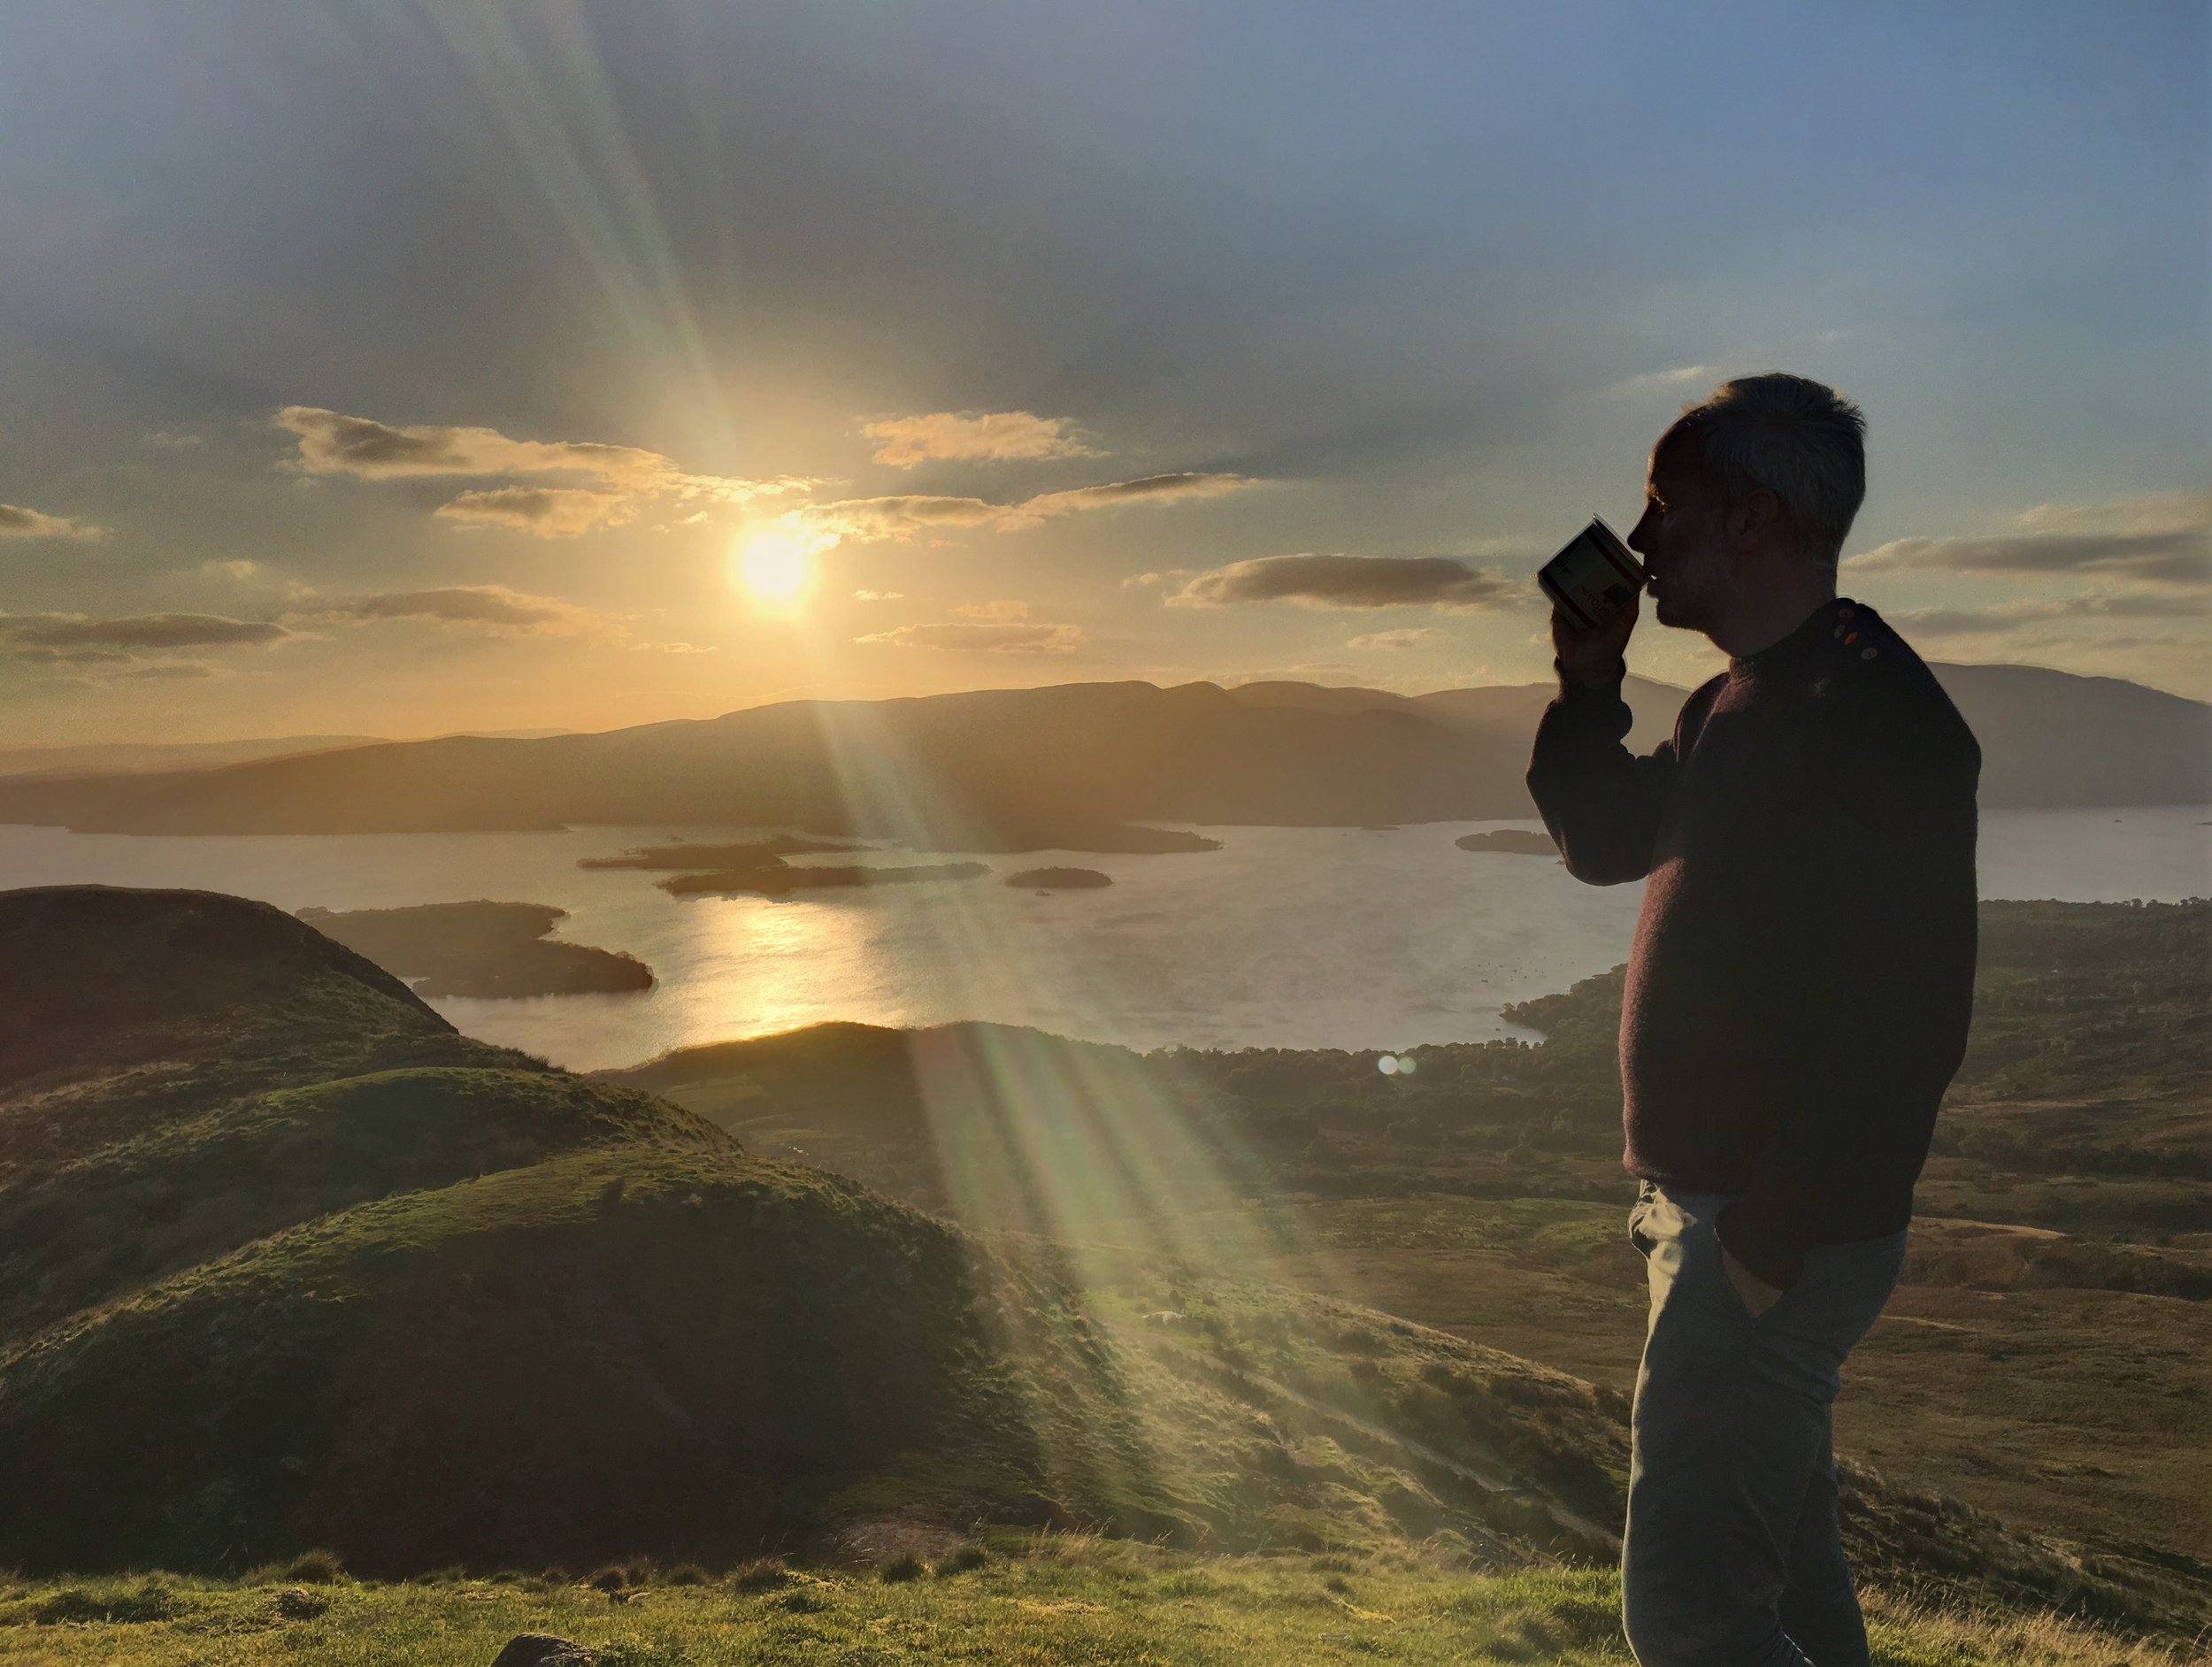 traveller enjoying whisky and a sunset